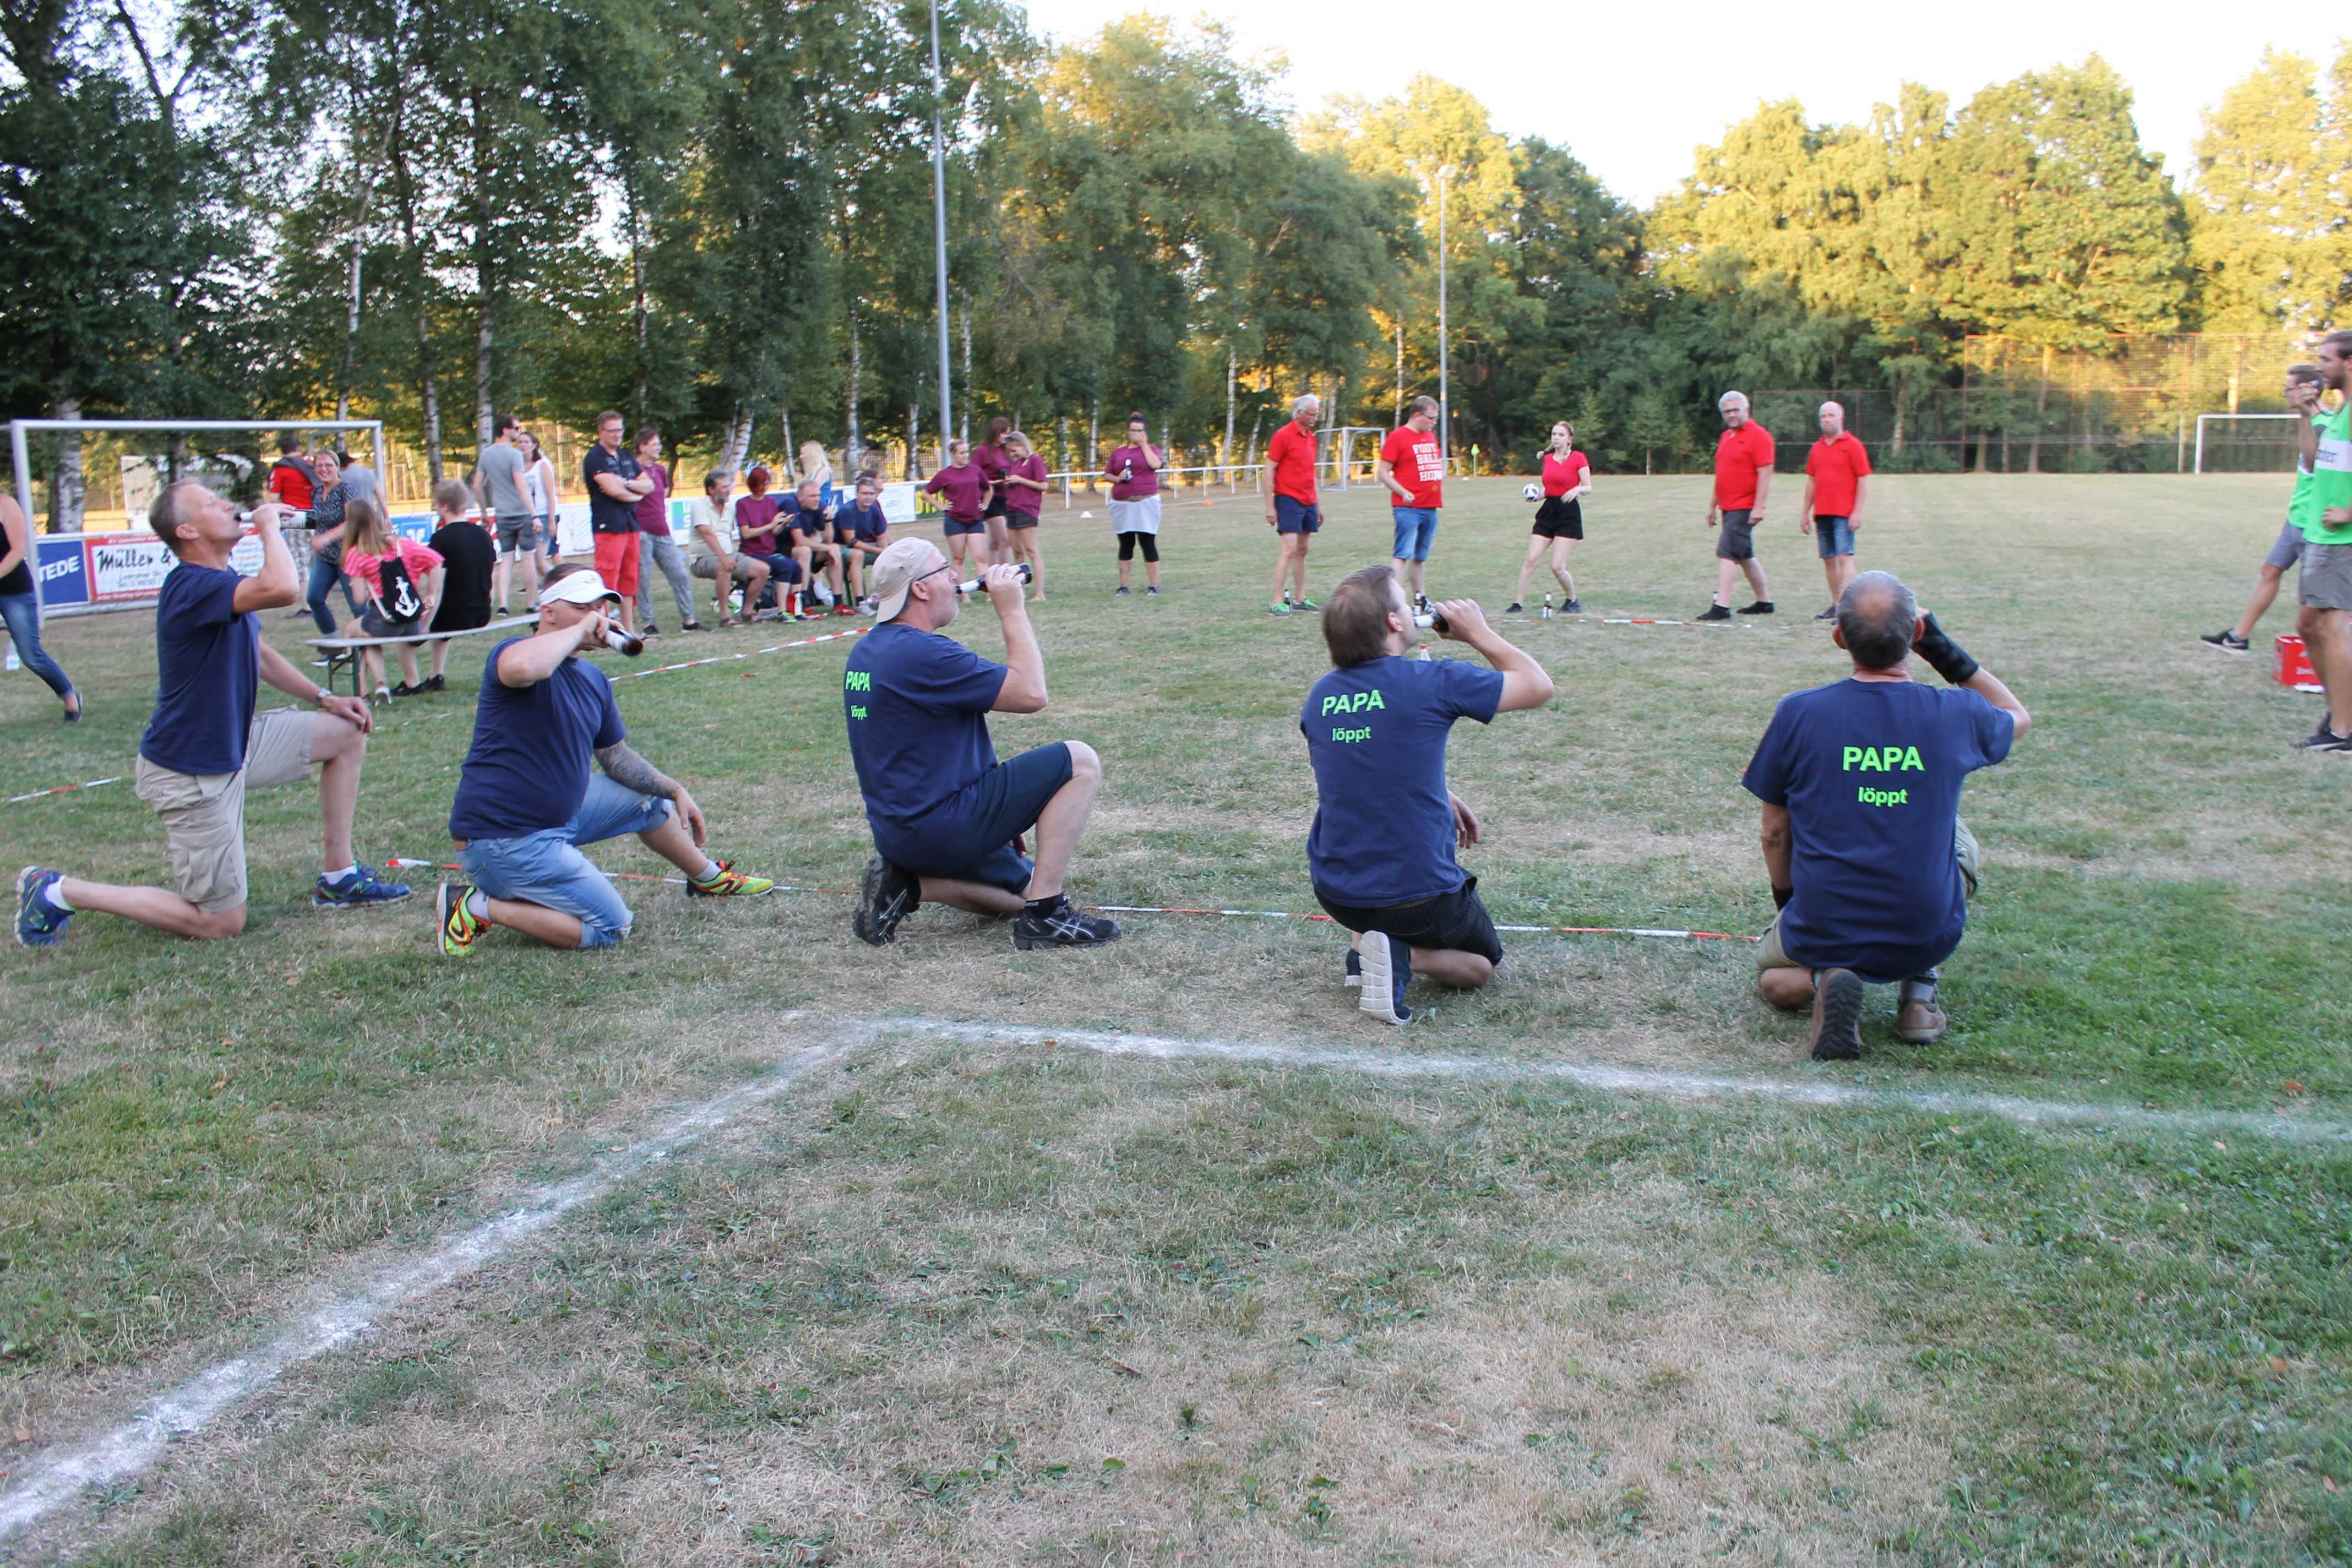 2018-07-27 Sportwoche - Flunkyball Turnier (59)